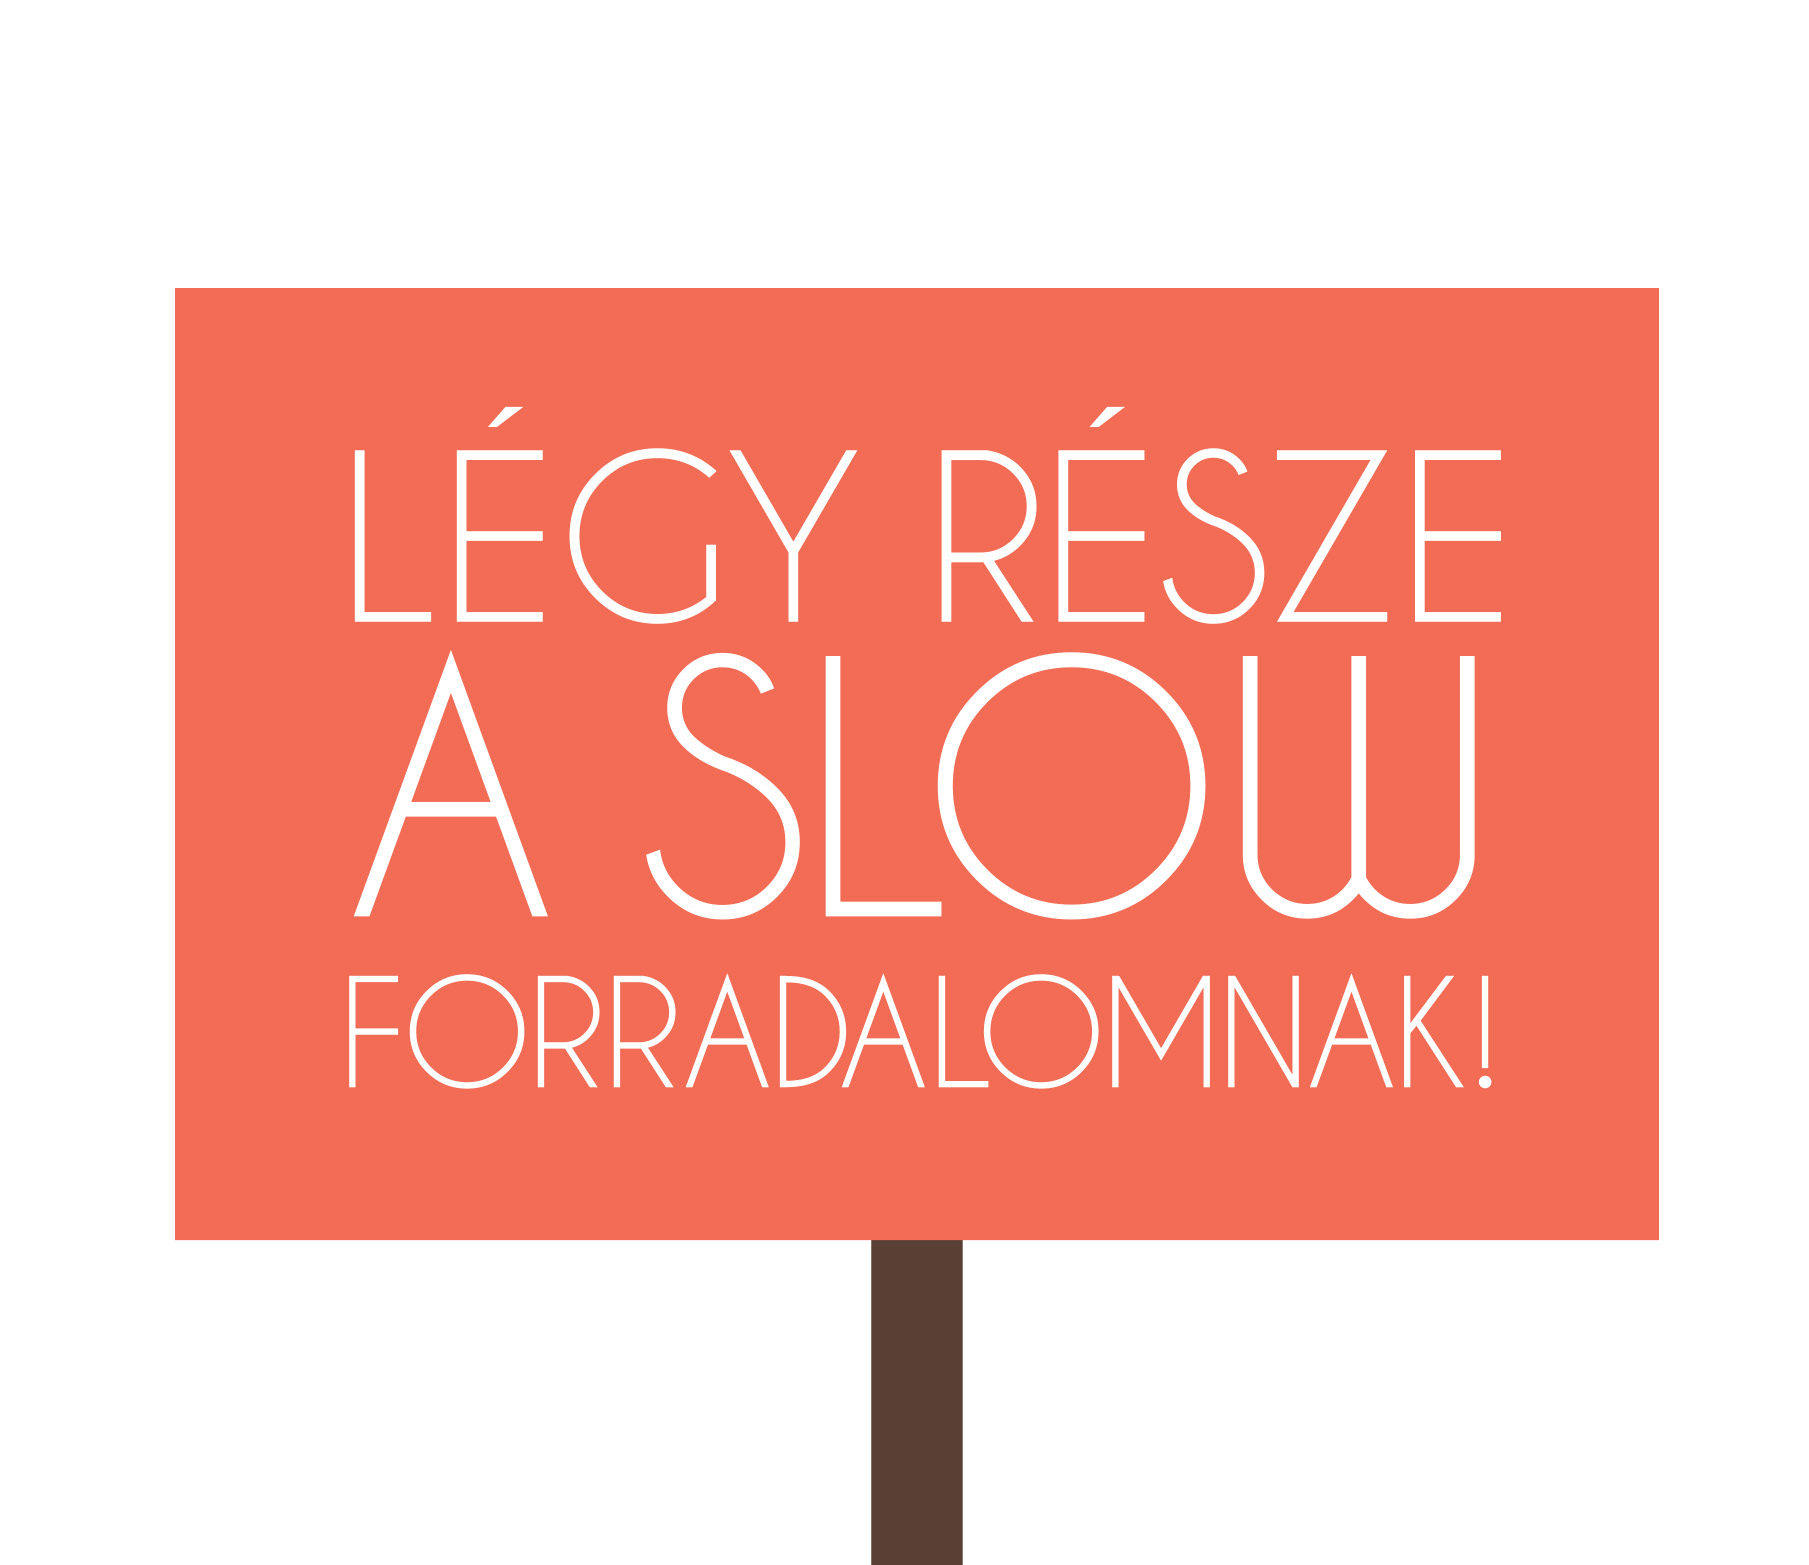 Slow forradalom